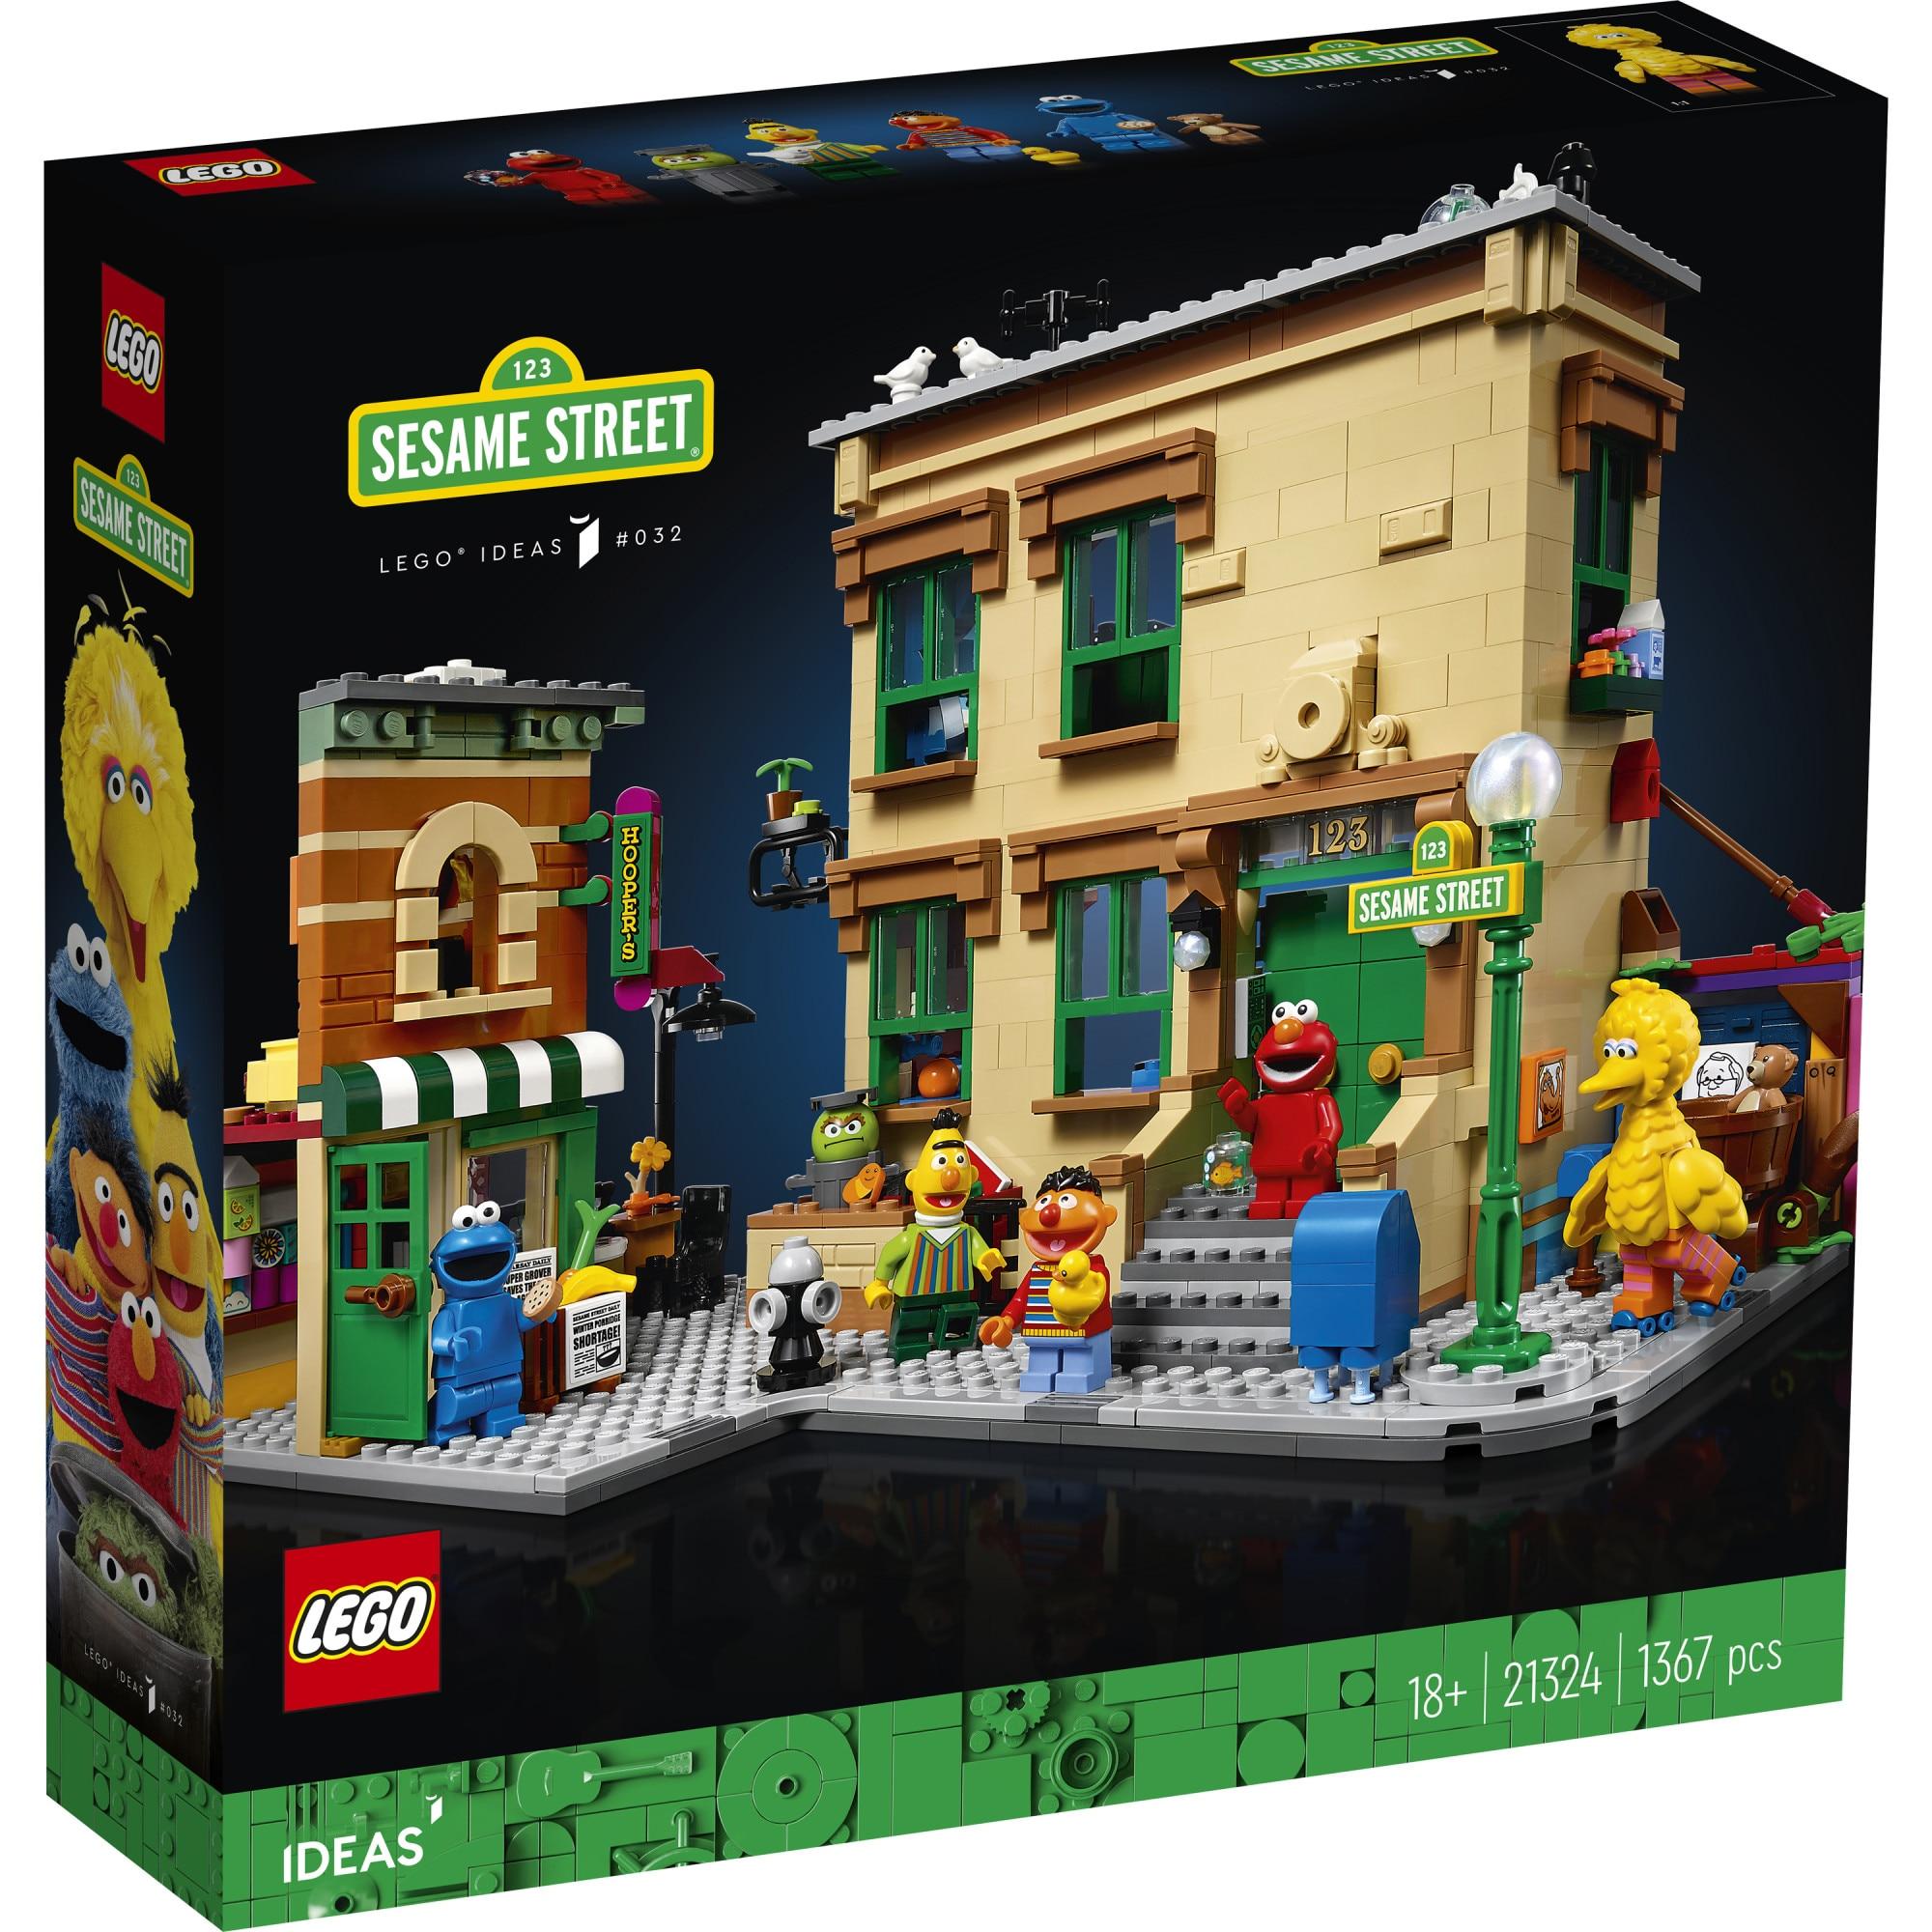 Fotografie LEGO Ideas - Sesame Street 21324, 1367 piese